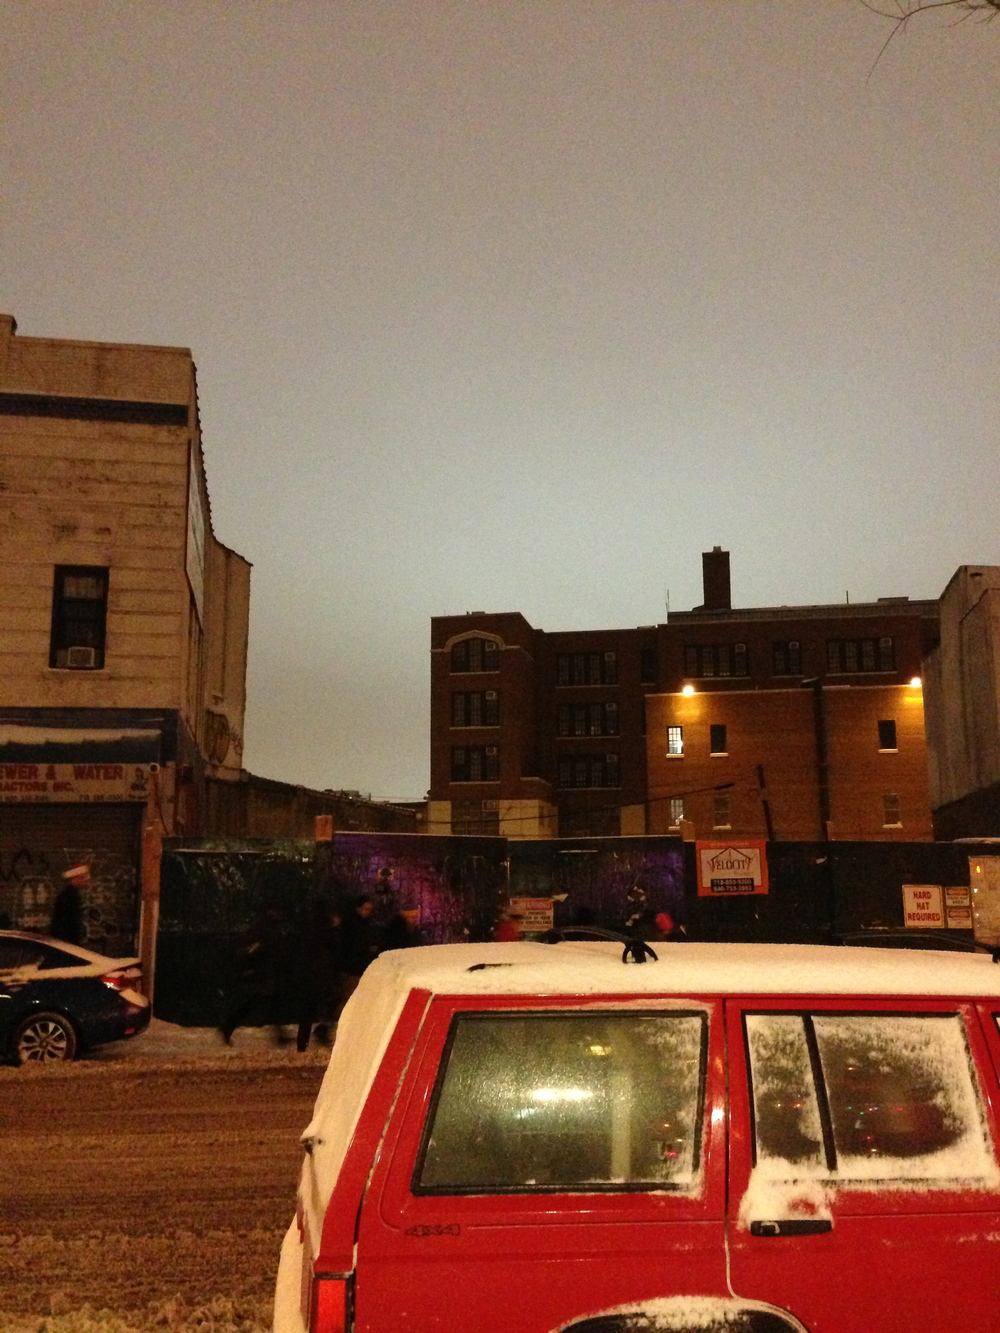 Kristine&Giuliana/Romy&Michele Trek the Blizzard in Brooklyn for 7 Bottles of Mixers..........5am Sky @ 10pm